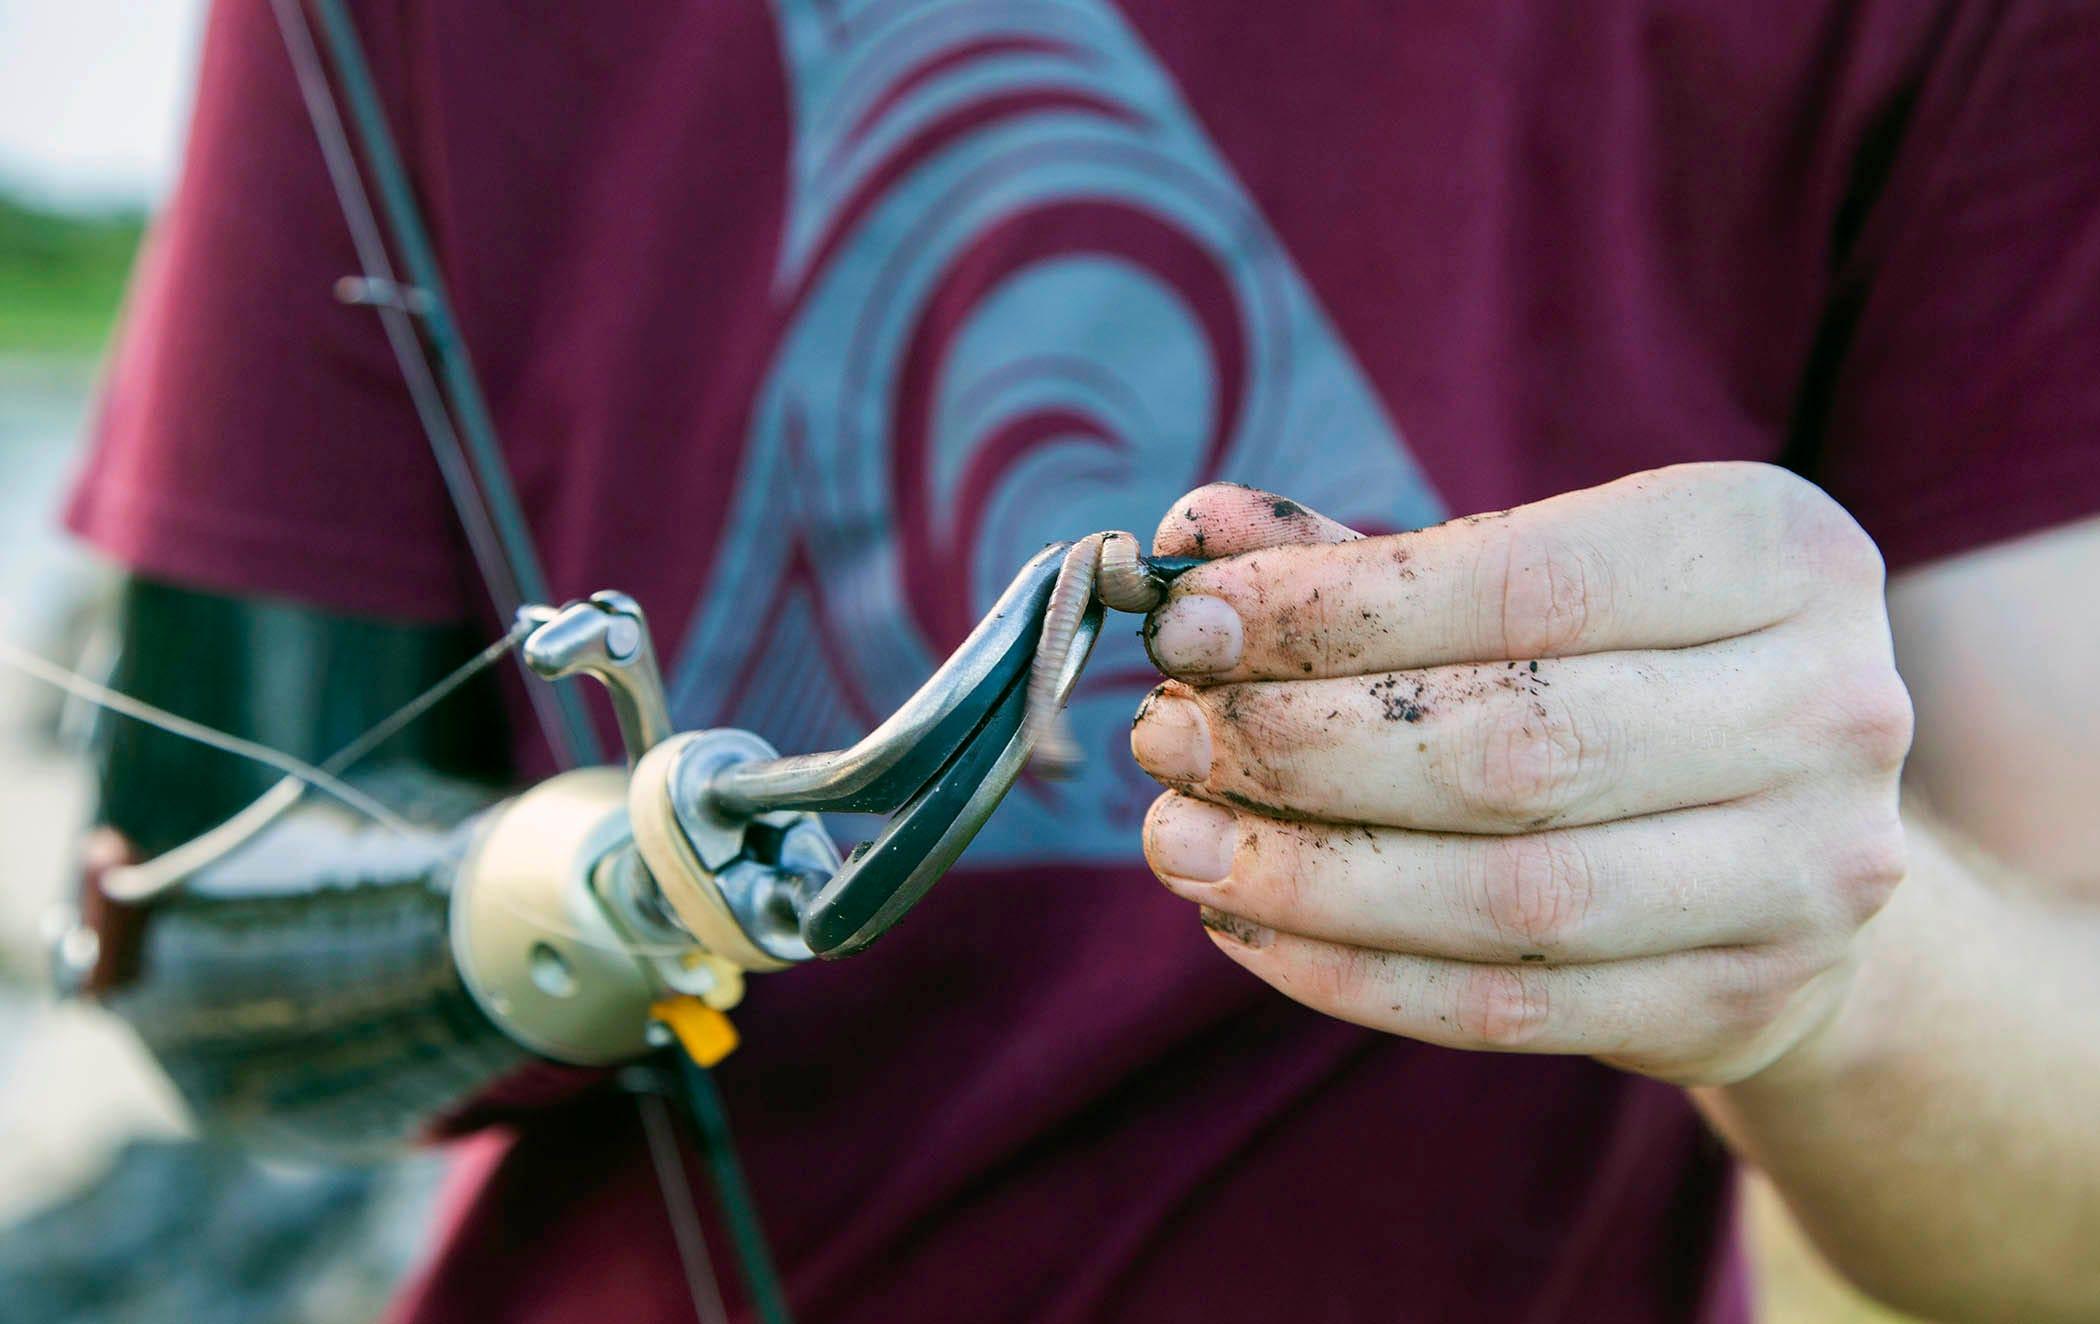 Carter Viss baits his hook Aug. 7 at Sandhill Crane Access Park.